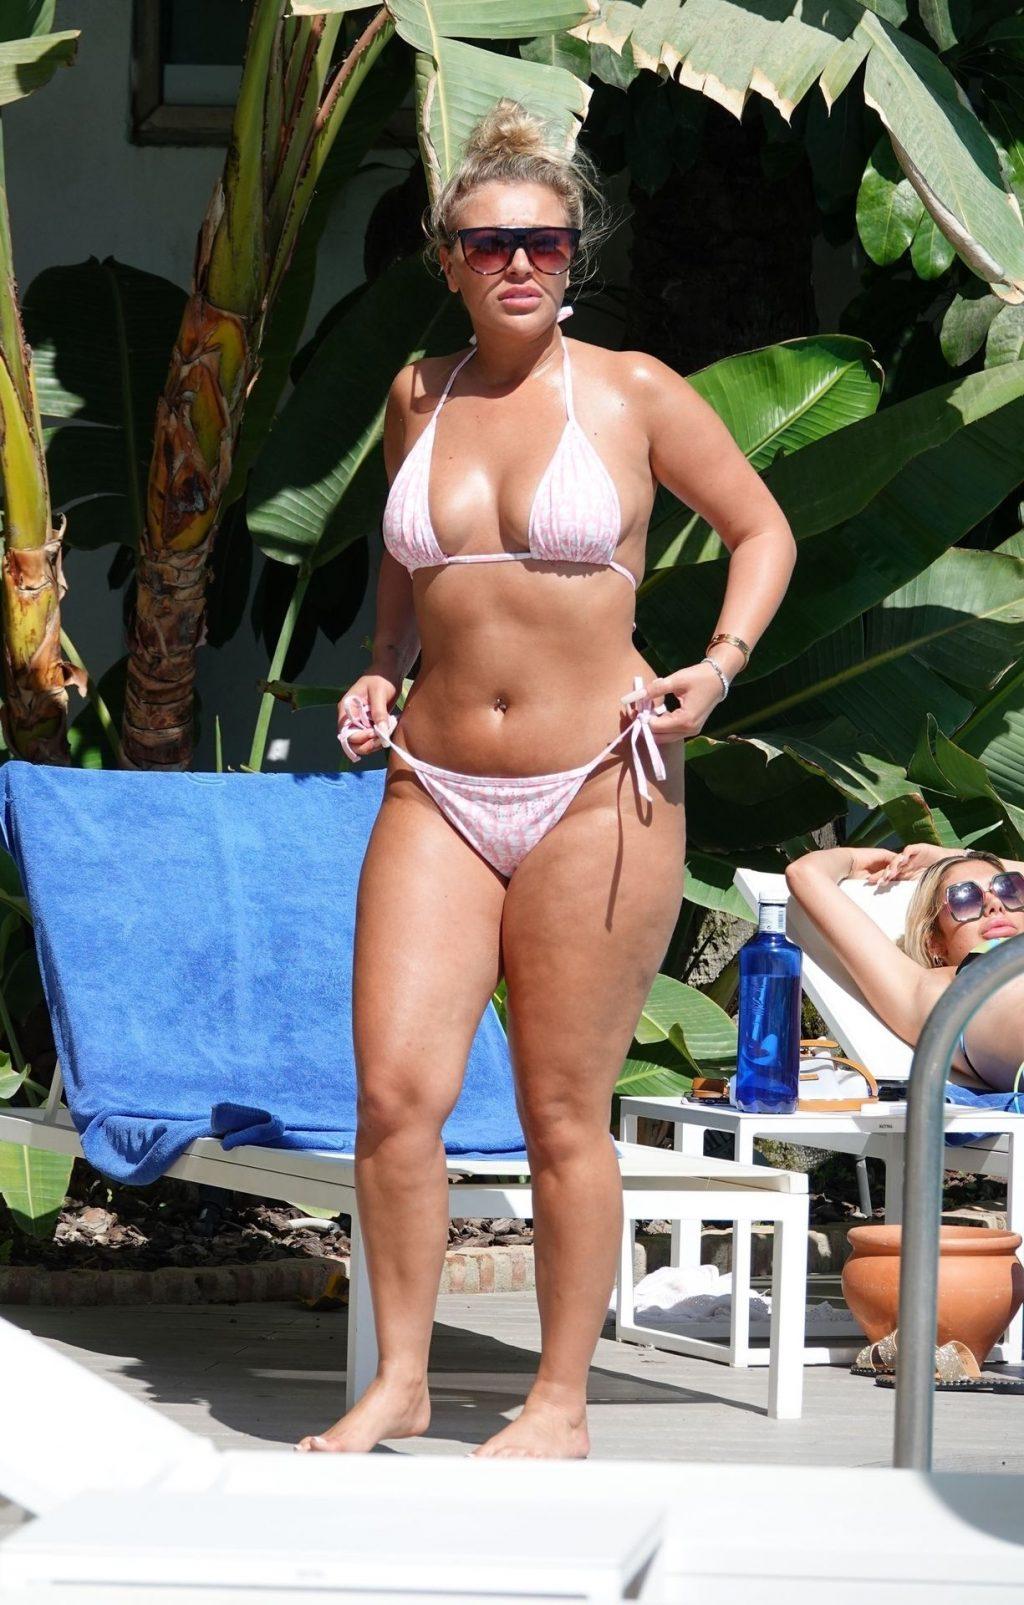 Chloe Ferry & Bethan Kershaw Slap On the Suncream on Holiday in Marbella (51 Photos)